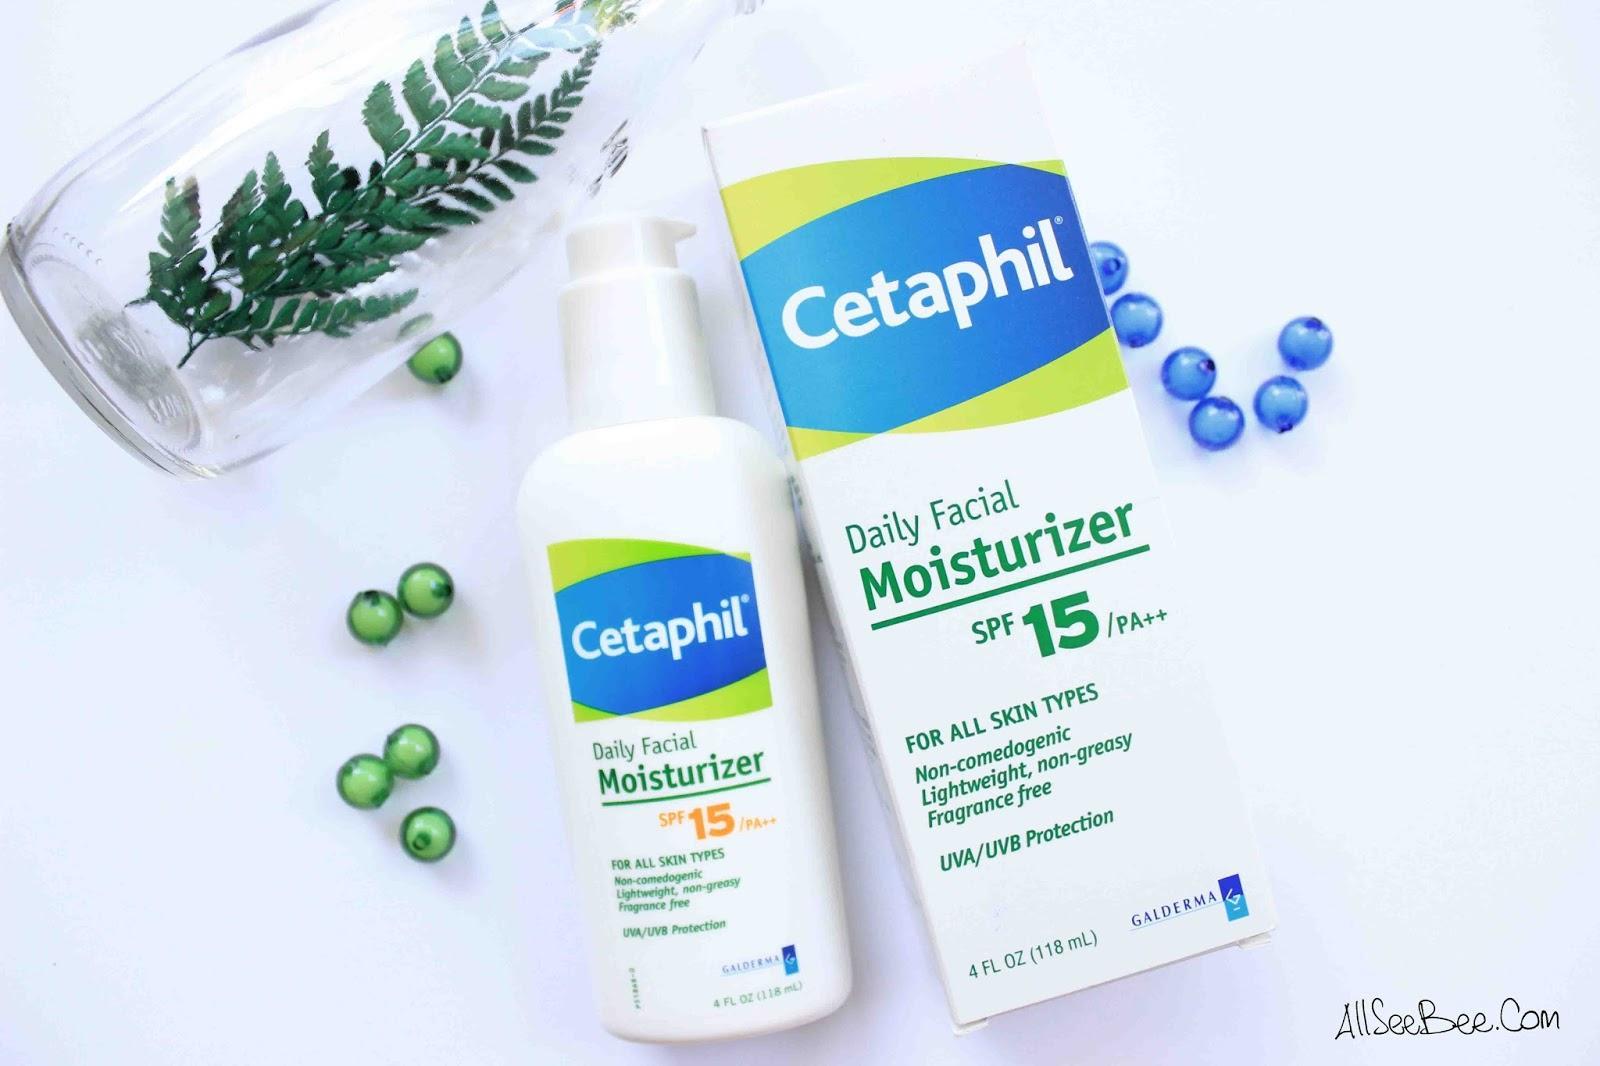 Cetaphil Daily Face Moisturizer SPF15/PA++ USA Formula